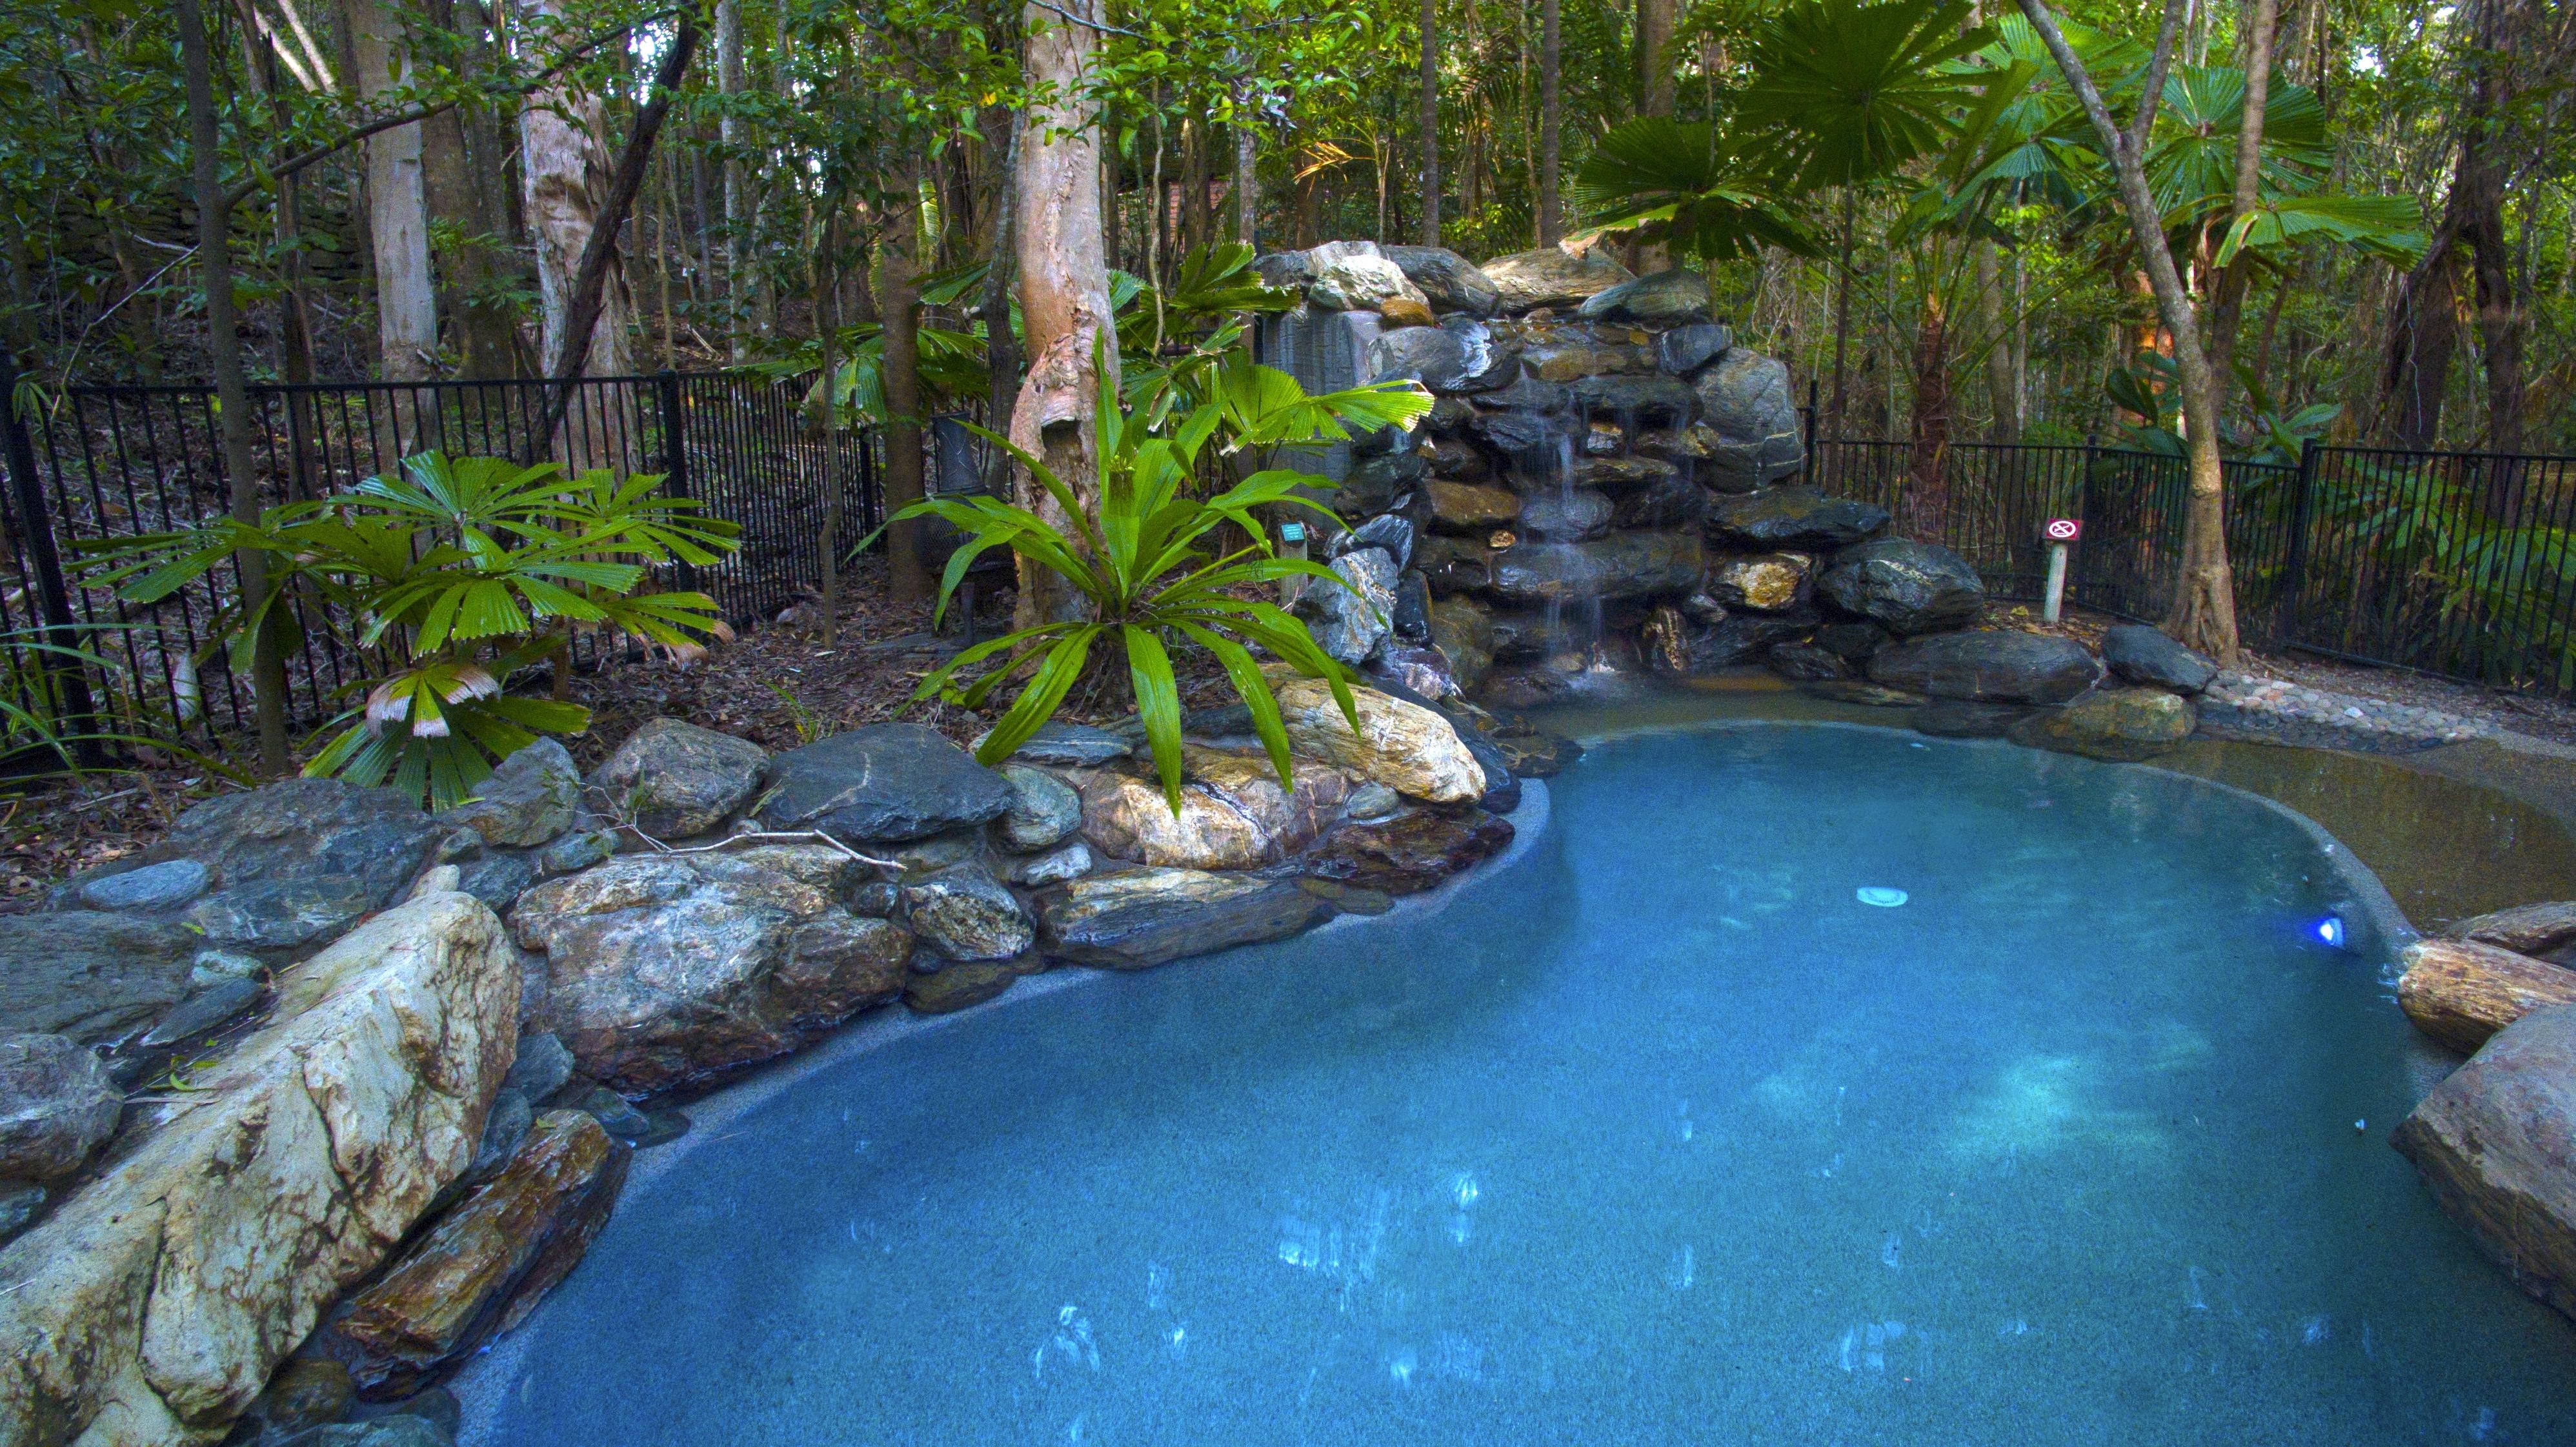 https://www.thalabeach.com.au/wp-content/uploads/2010/07/Thala_Beach_Nature_Reserve_2016__188.jpg